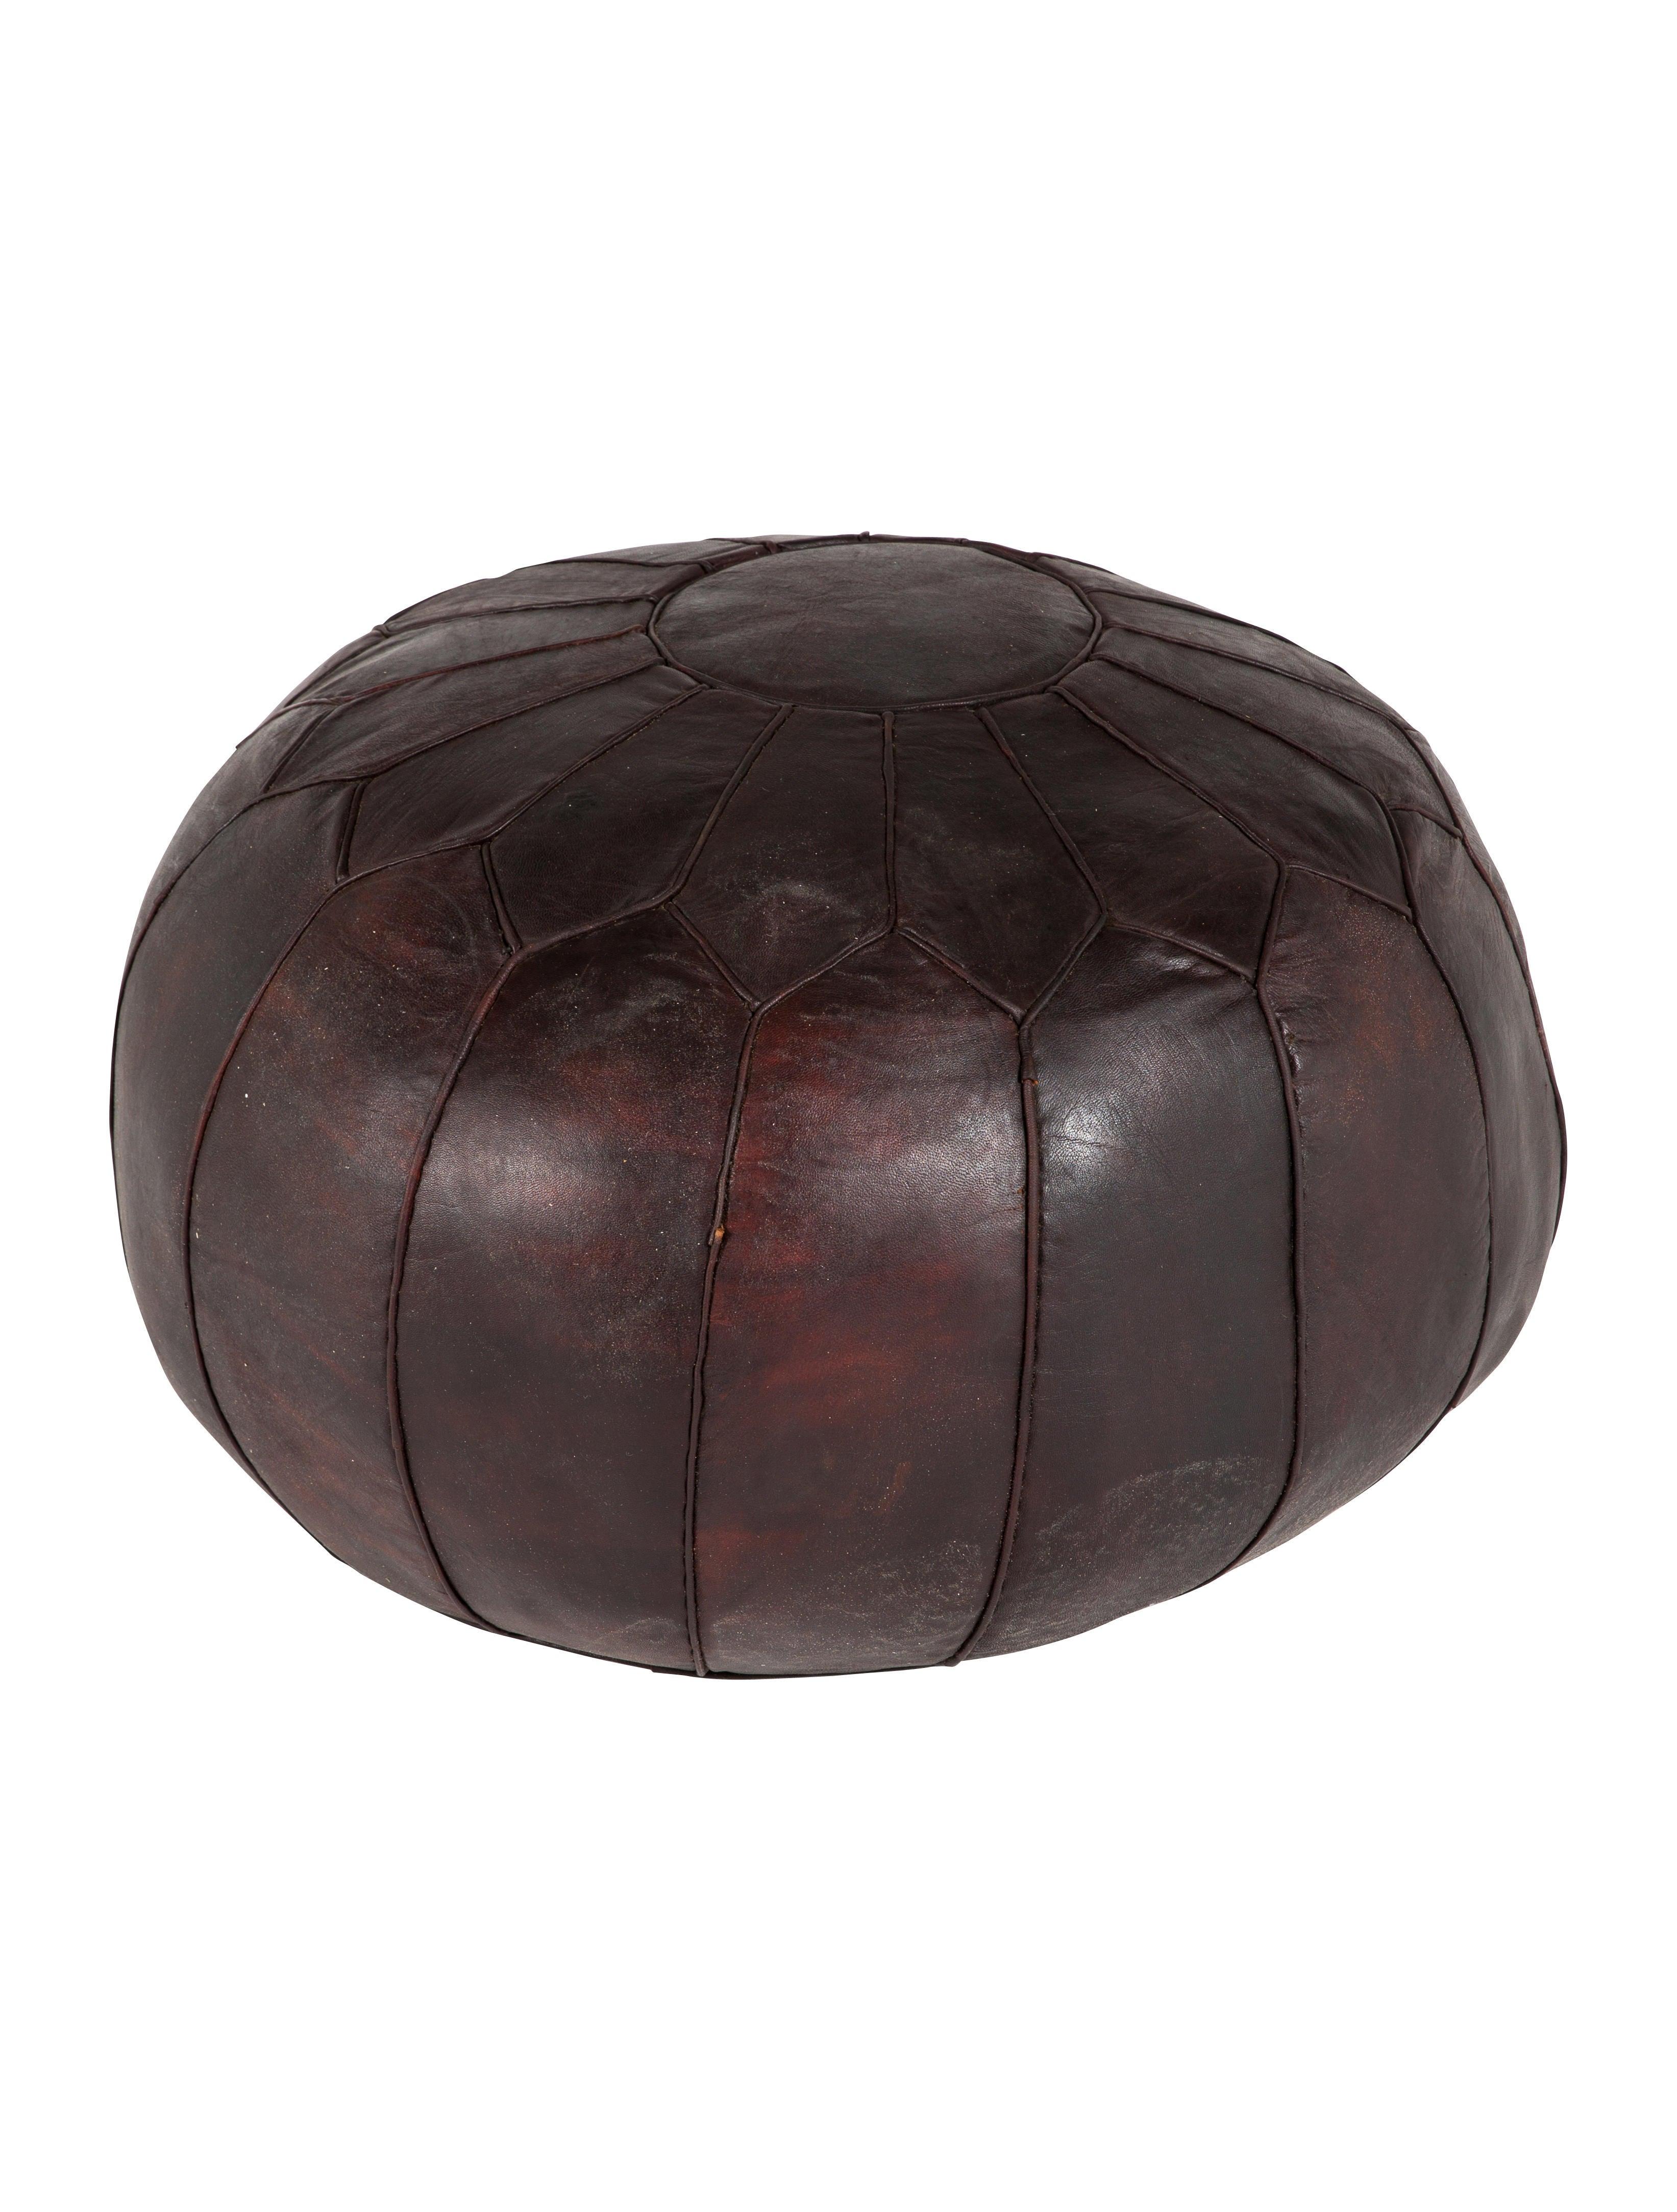 soukie modern moroccan leather pouf furniture furni20750 the realreal